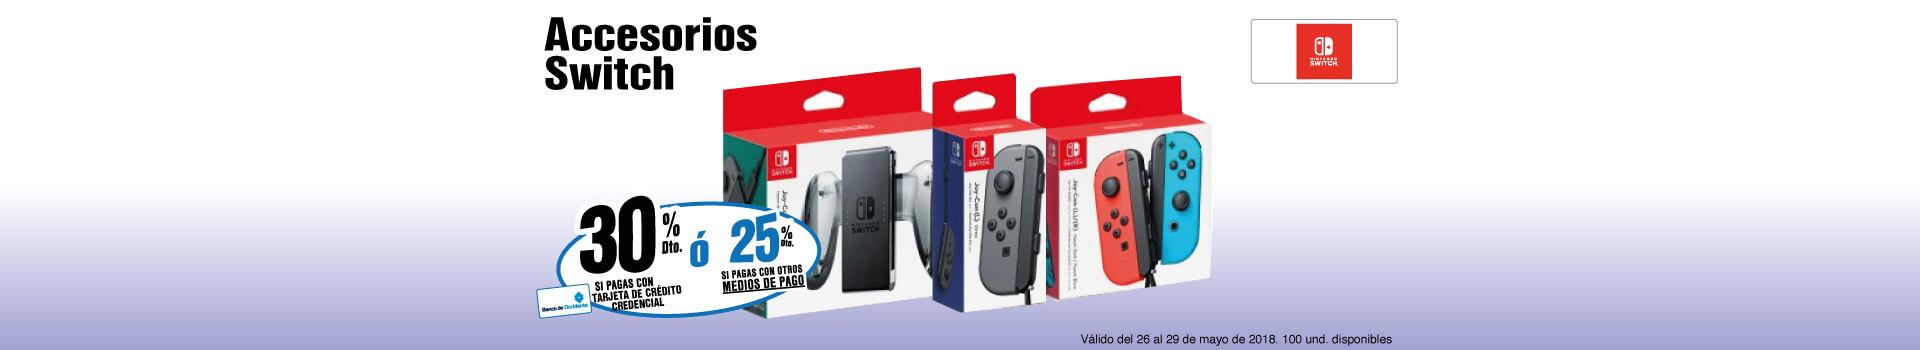 AK-KT-BCAT-7-videojuegos-PP---Nintendo-accesorios-May26